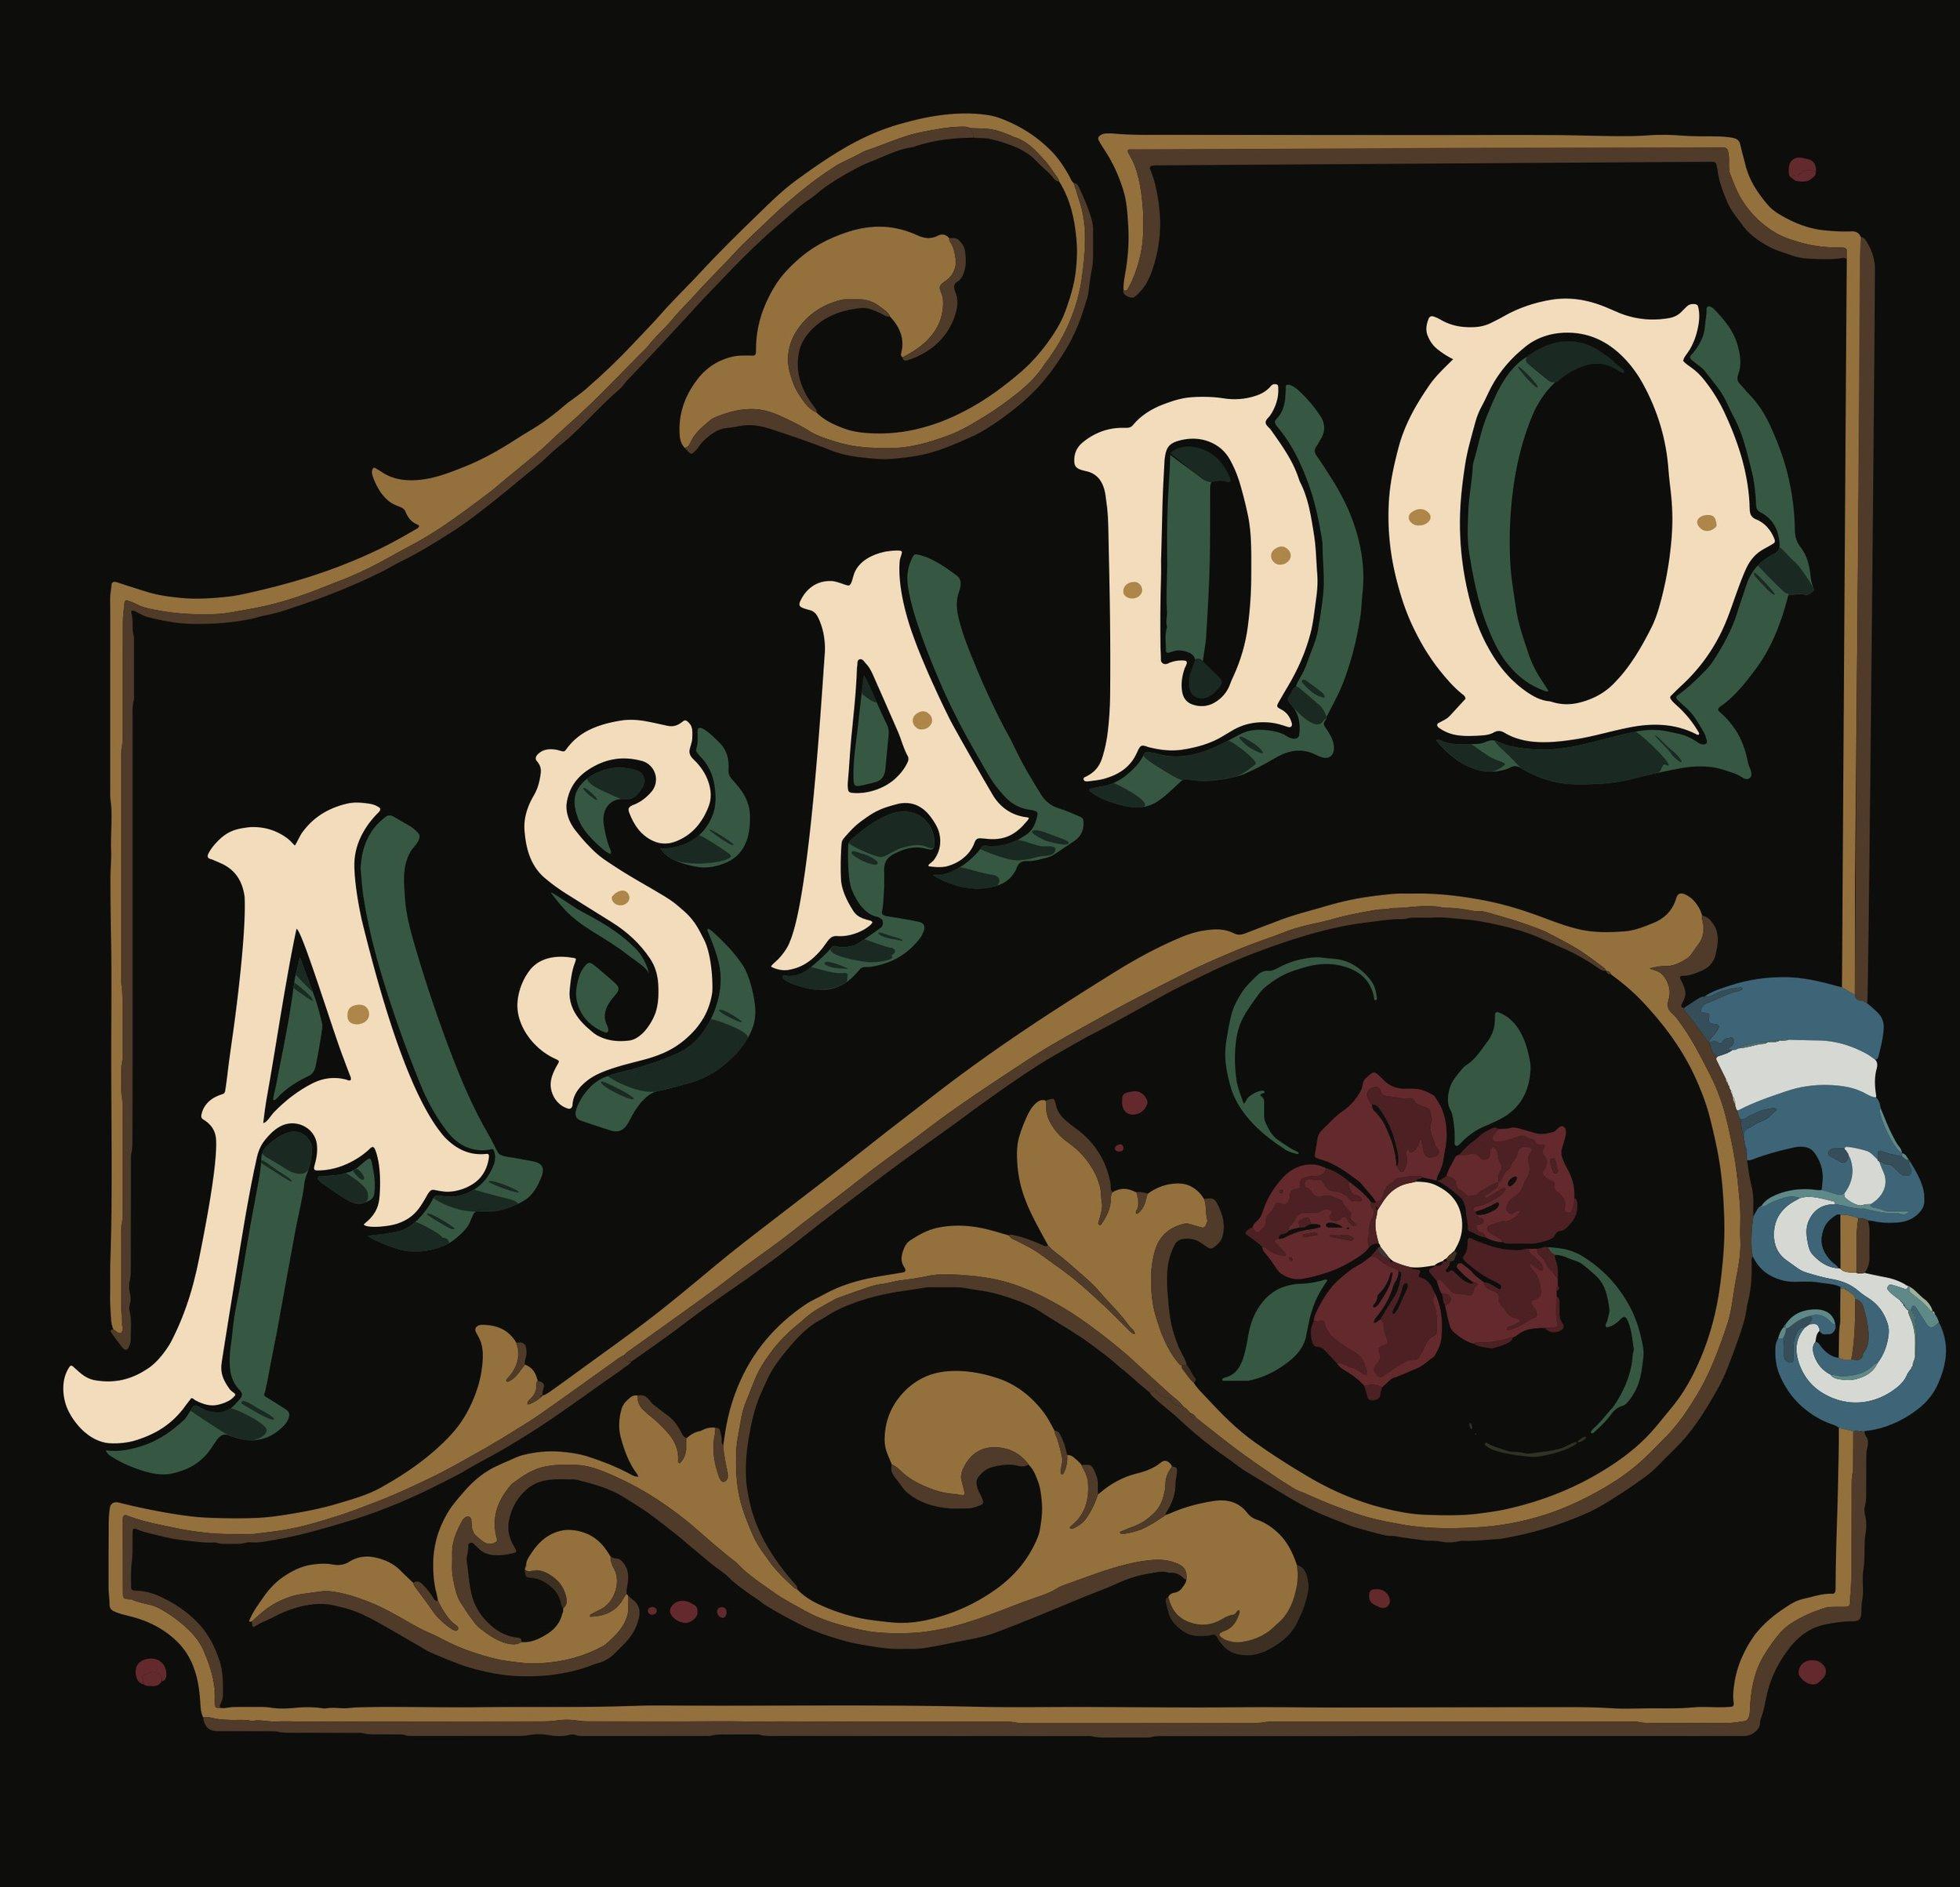 asado artwork.jpg